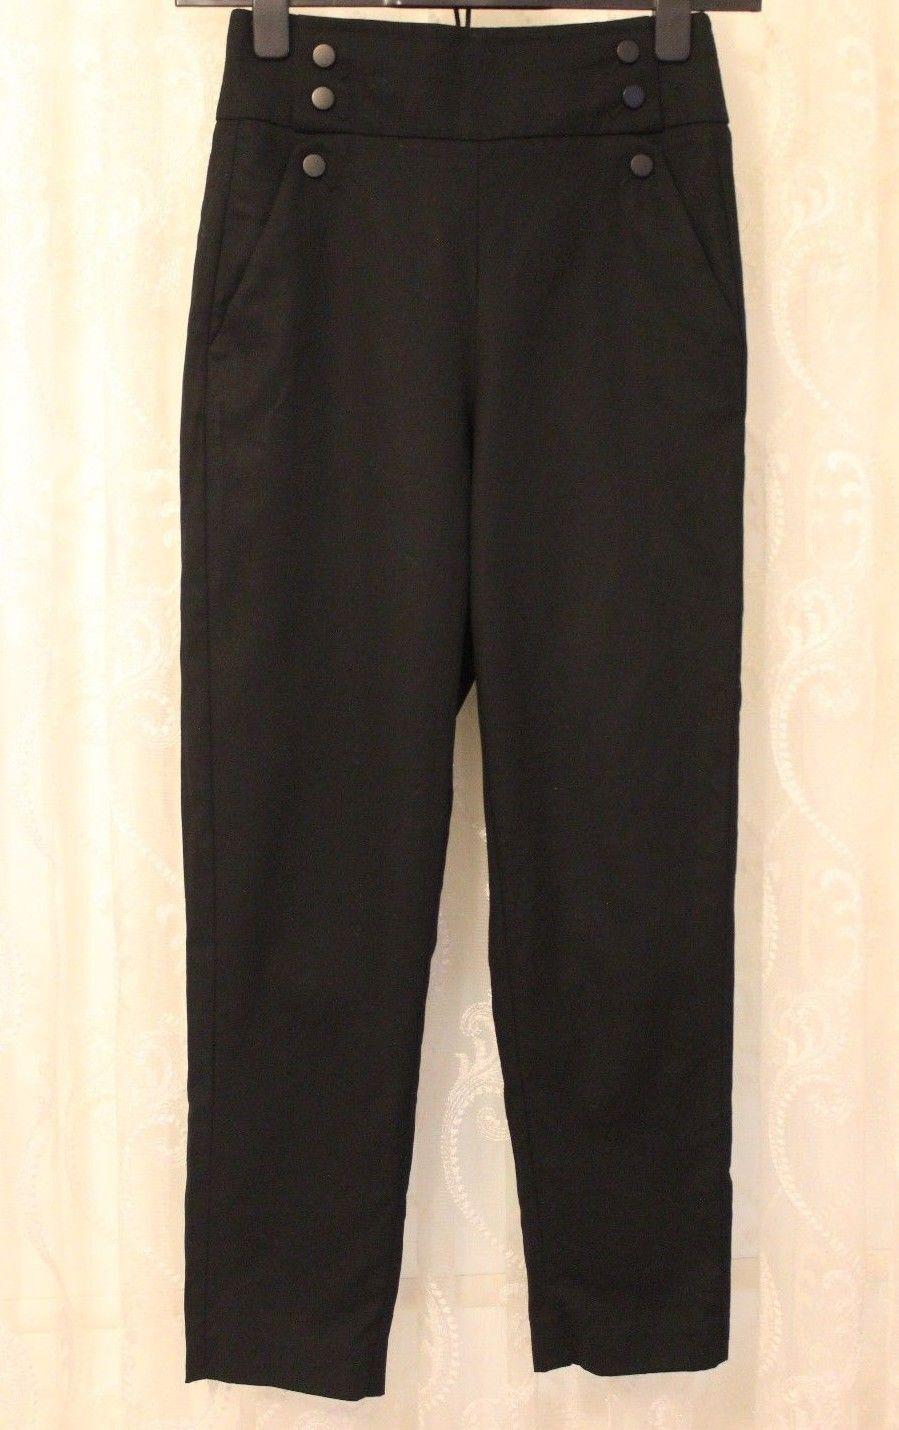 Karen Millen Noir Taille Haute marin Clous Capri Crop Pantalon 10 12 PA048